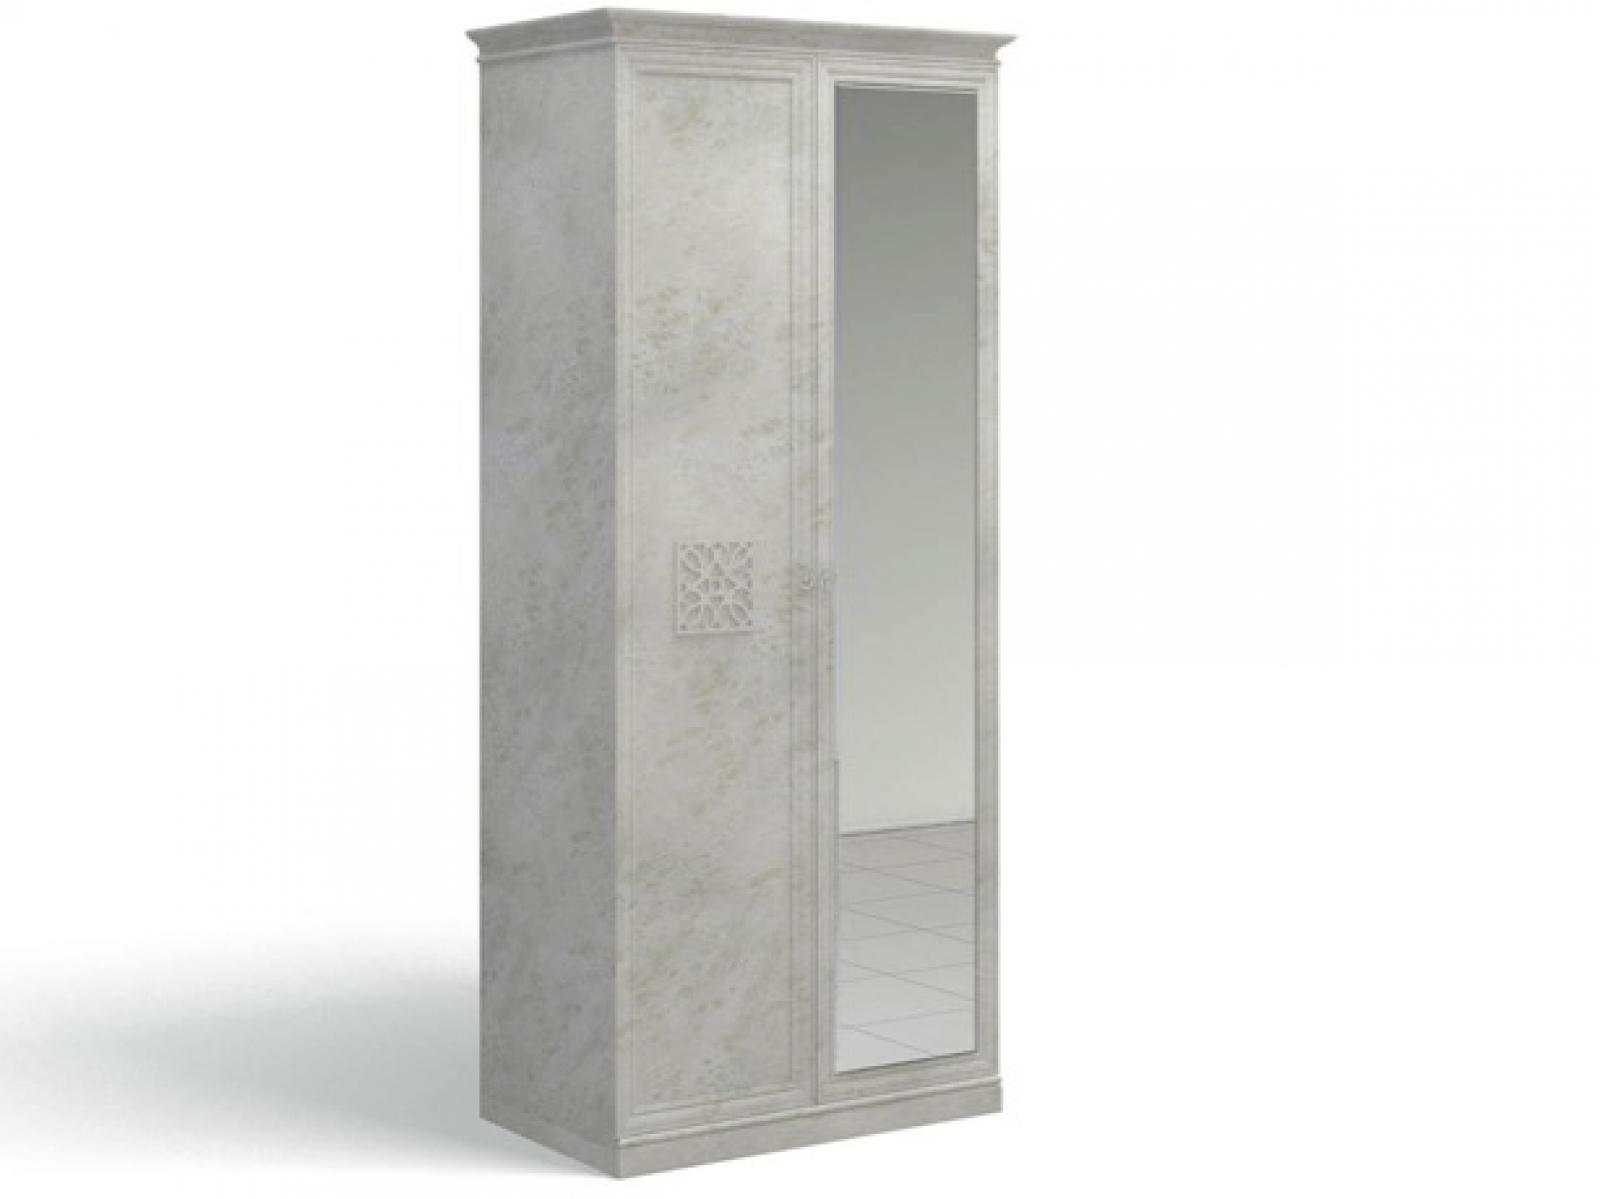 Ария Светлая Шкаф для одежды с зеркалом 701.01Z-B - 1